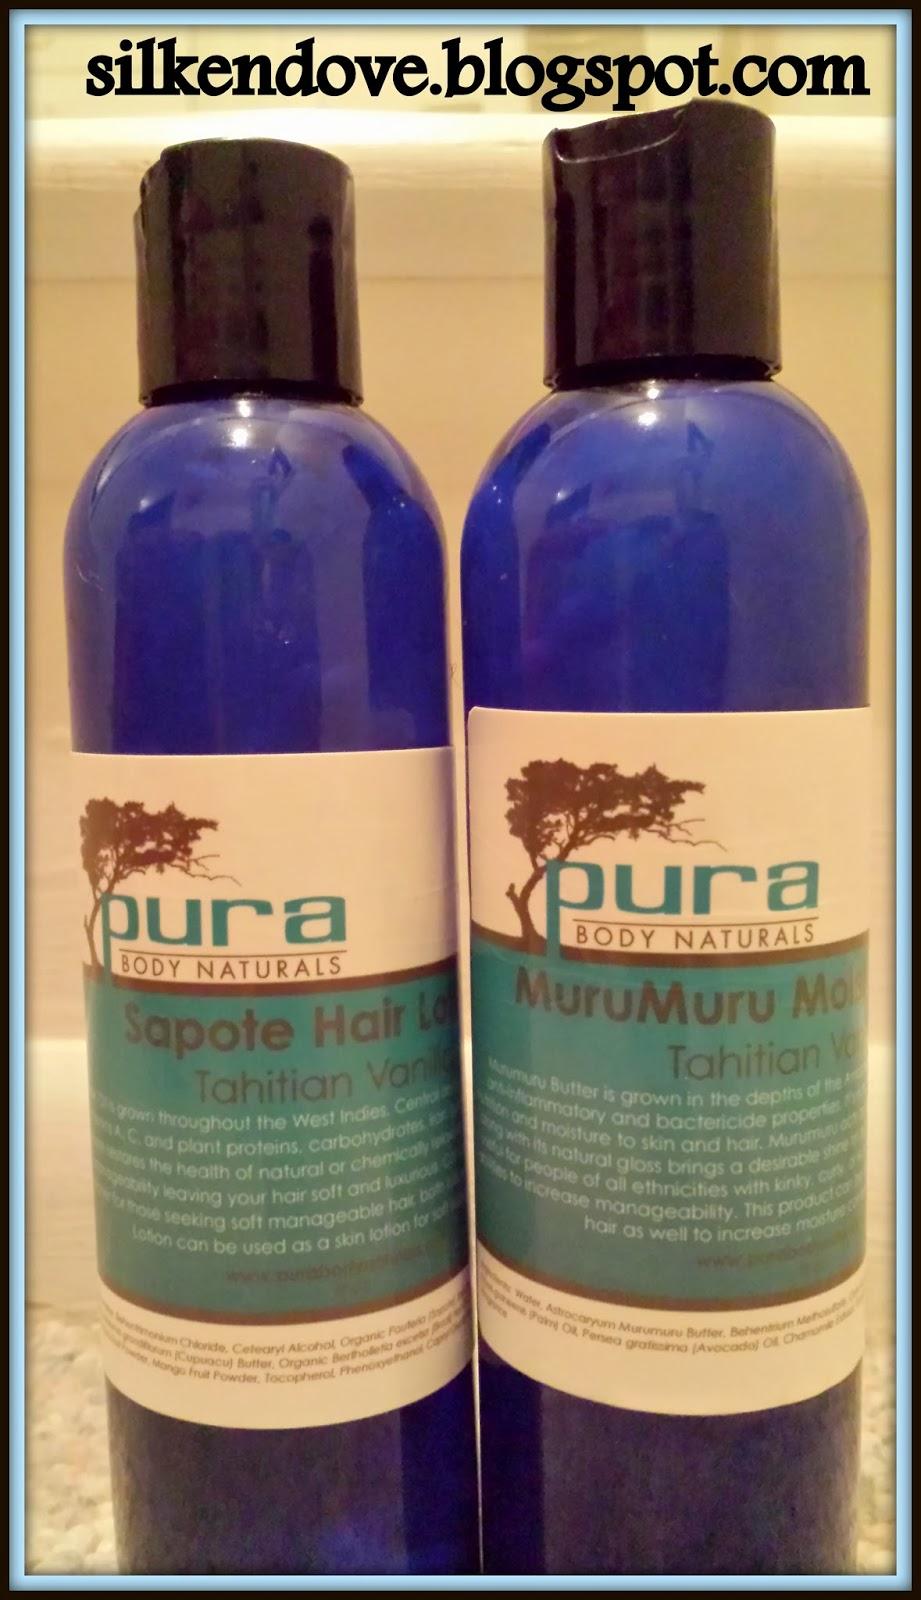 Pura Body Naturals Hair Products